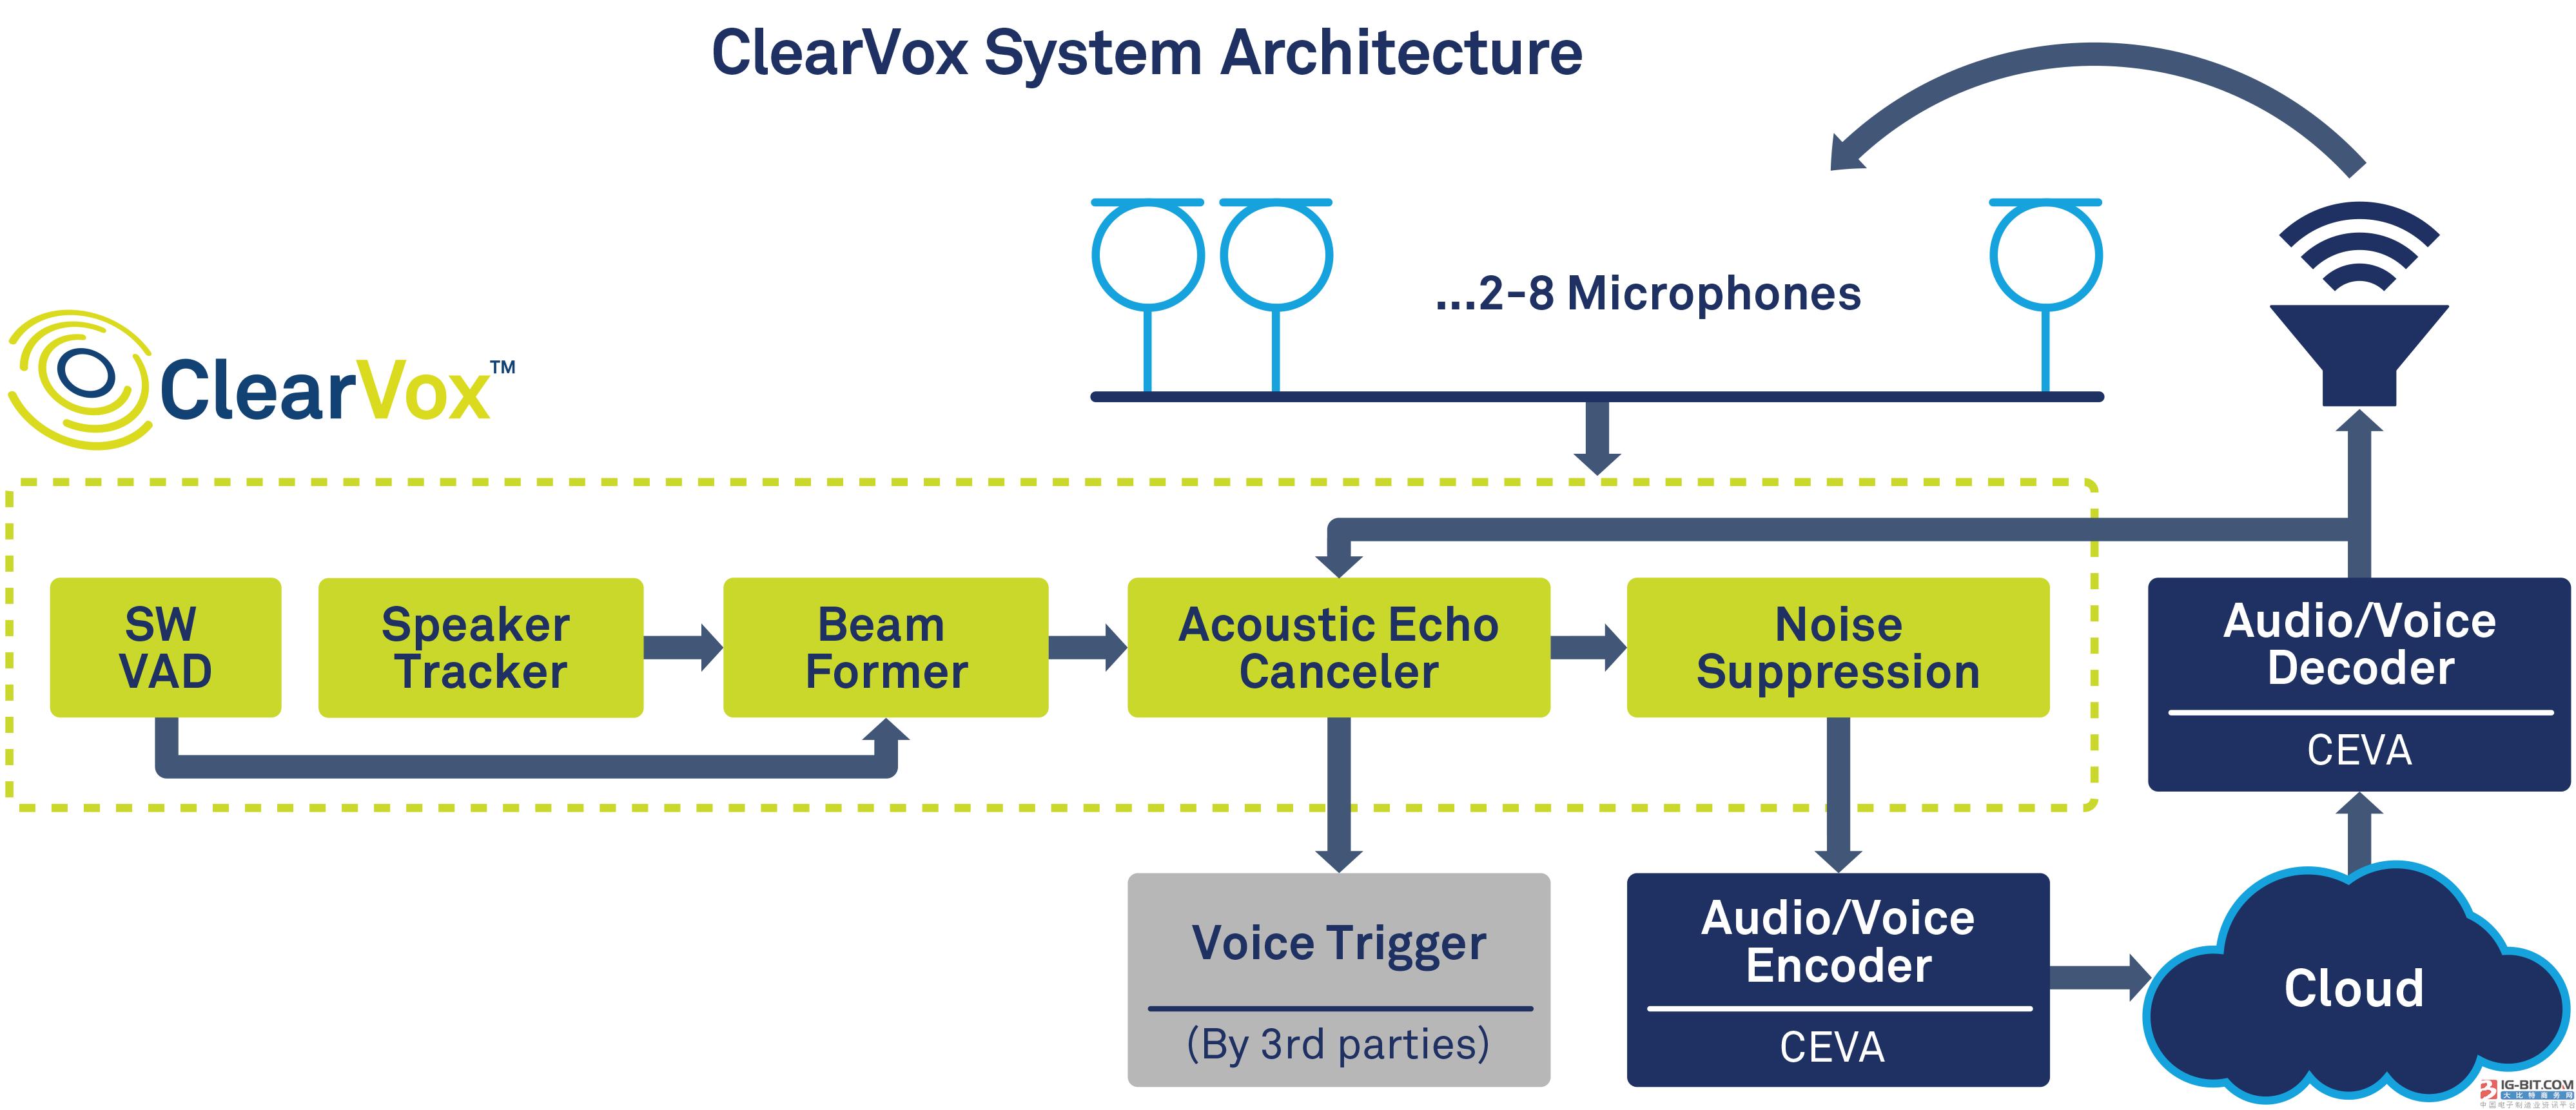 CEVA推出先进软件套件ClearVox™为语音设备提供 更高的语音智能